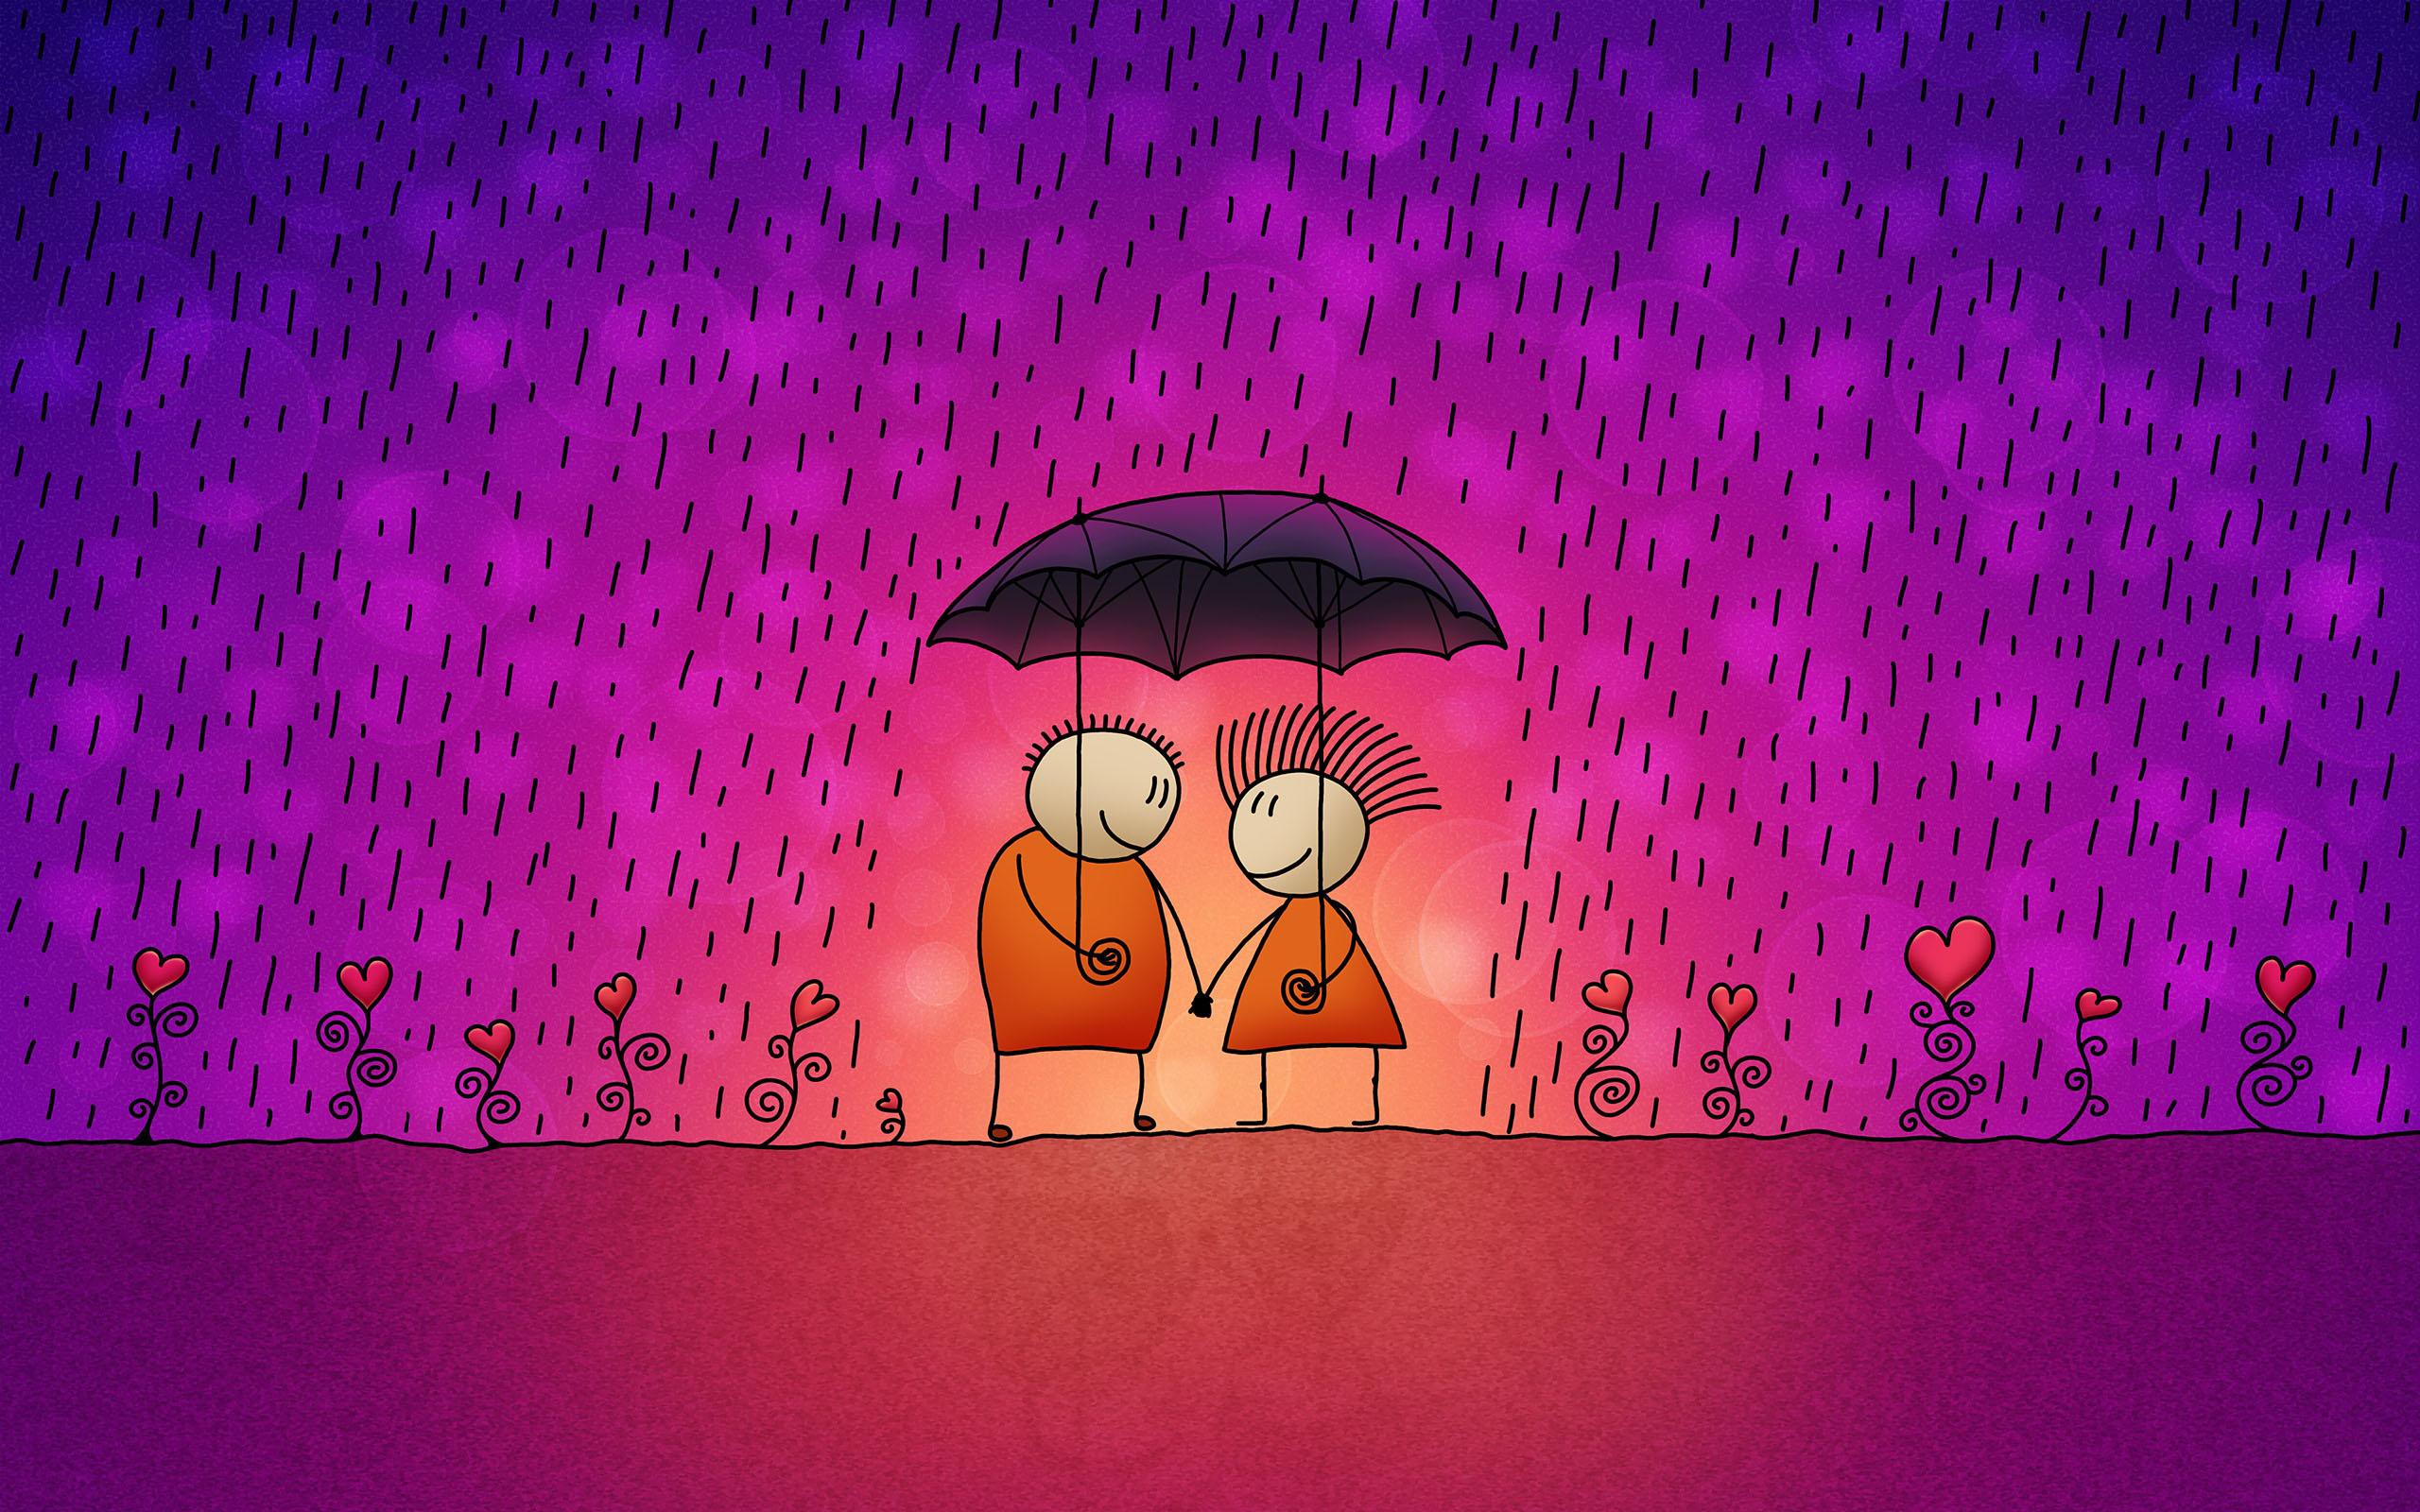 Download 2560x1600 Wallpaper Funny Cartoon Love Couple In The Rain